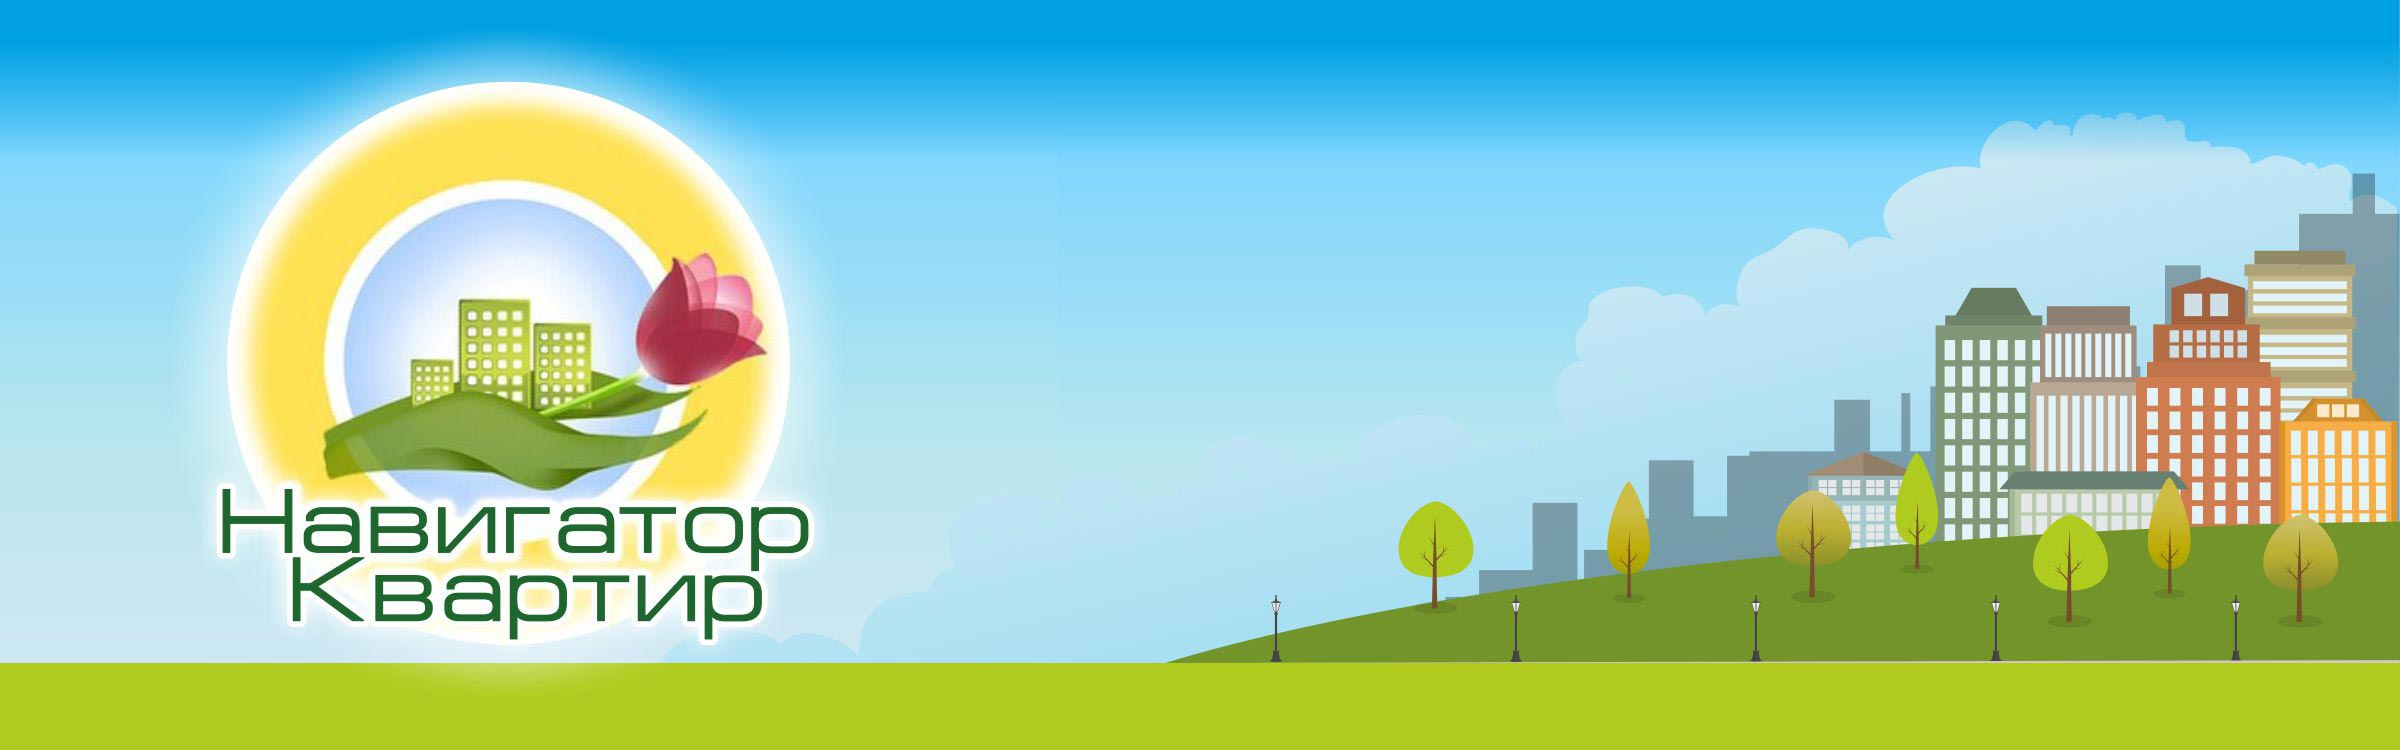 Агентство Недвижимости 'Навигатор квартир - Агентство Недвижимости' в Смоленске. Главная страница